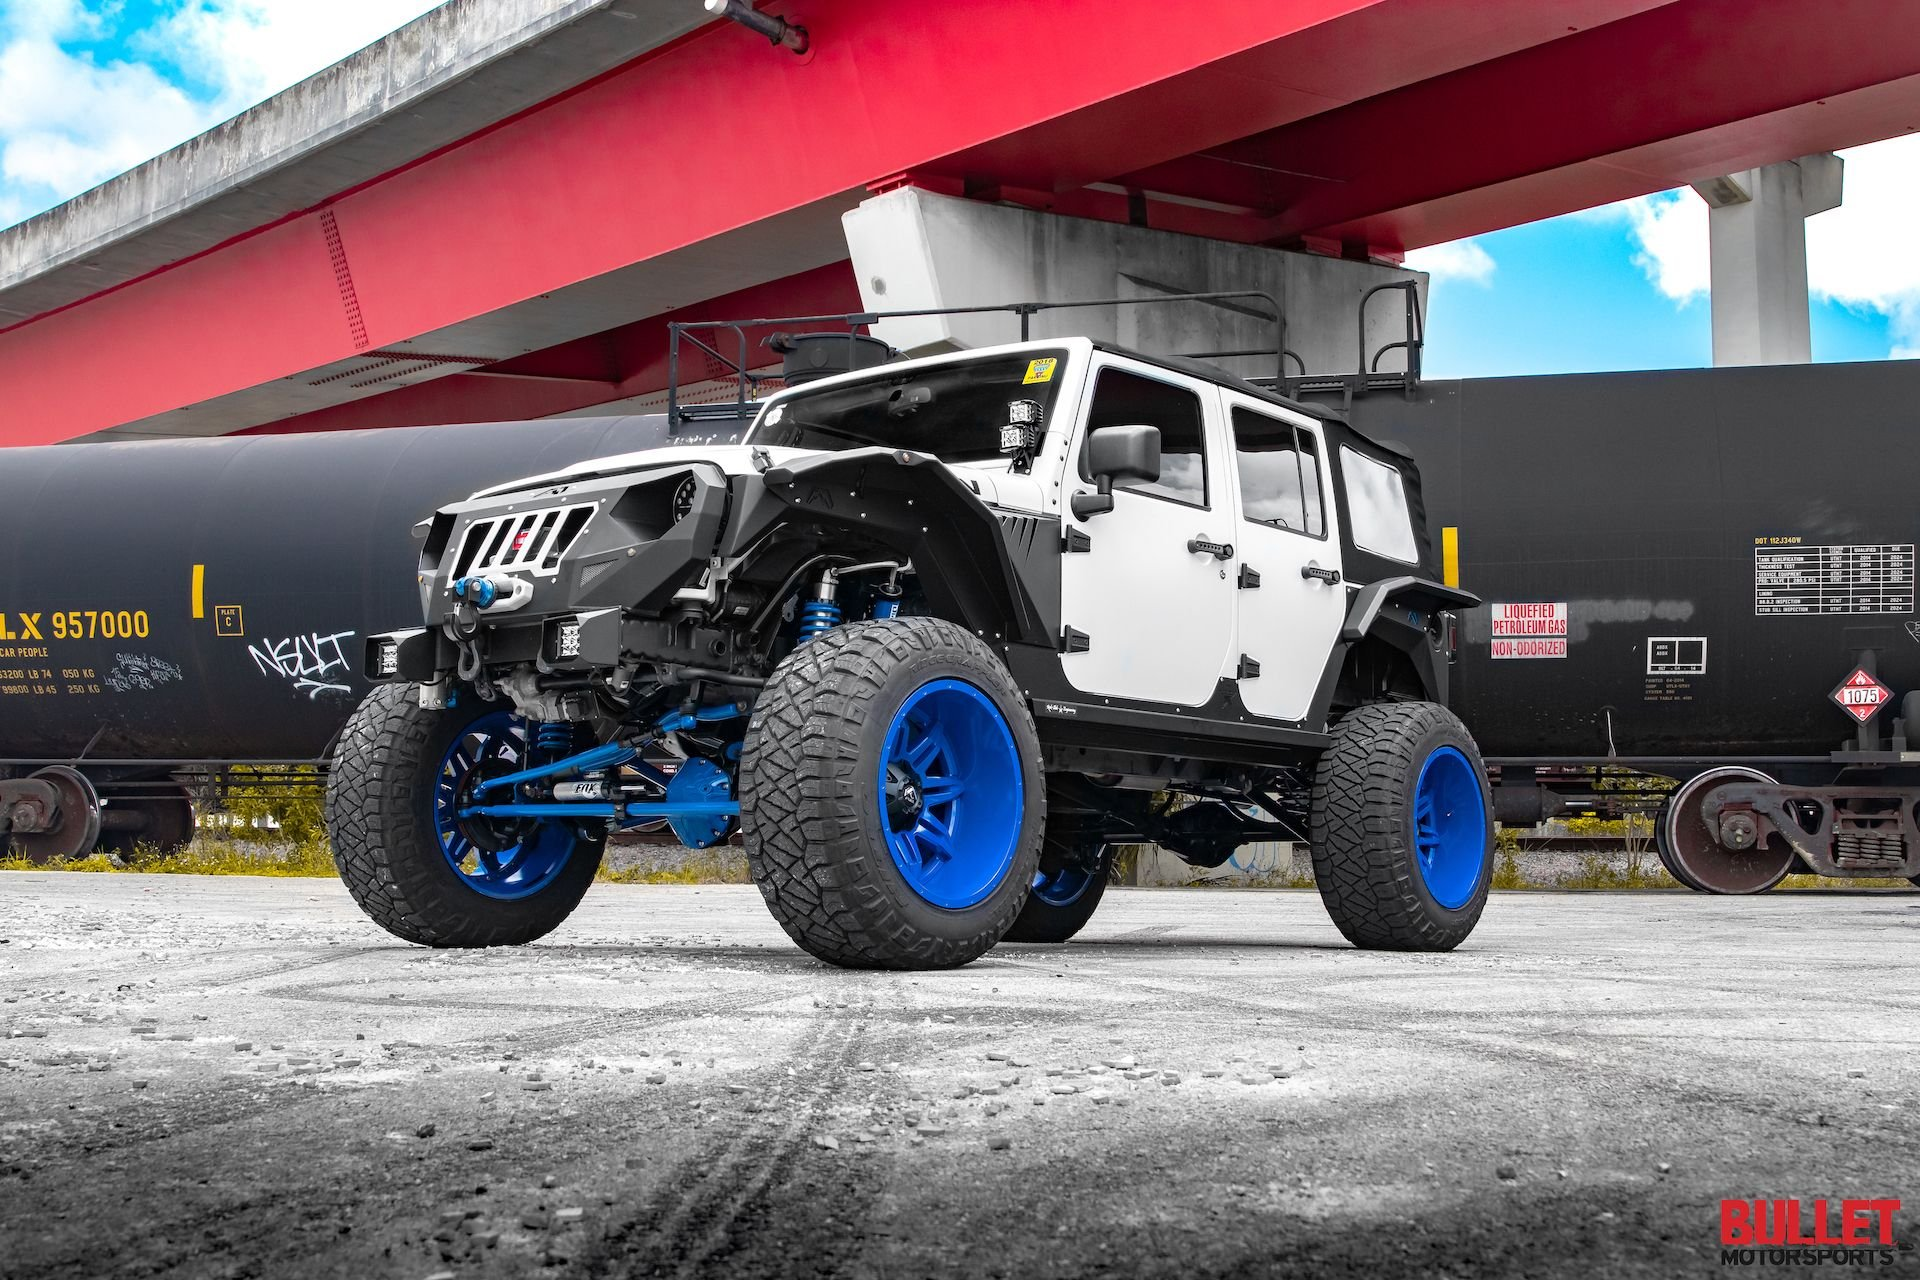 2014 jeep wrangler rubicon unlimited